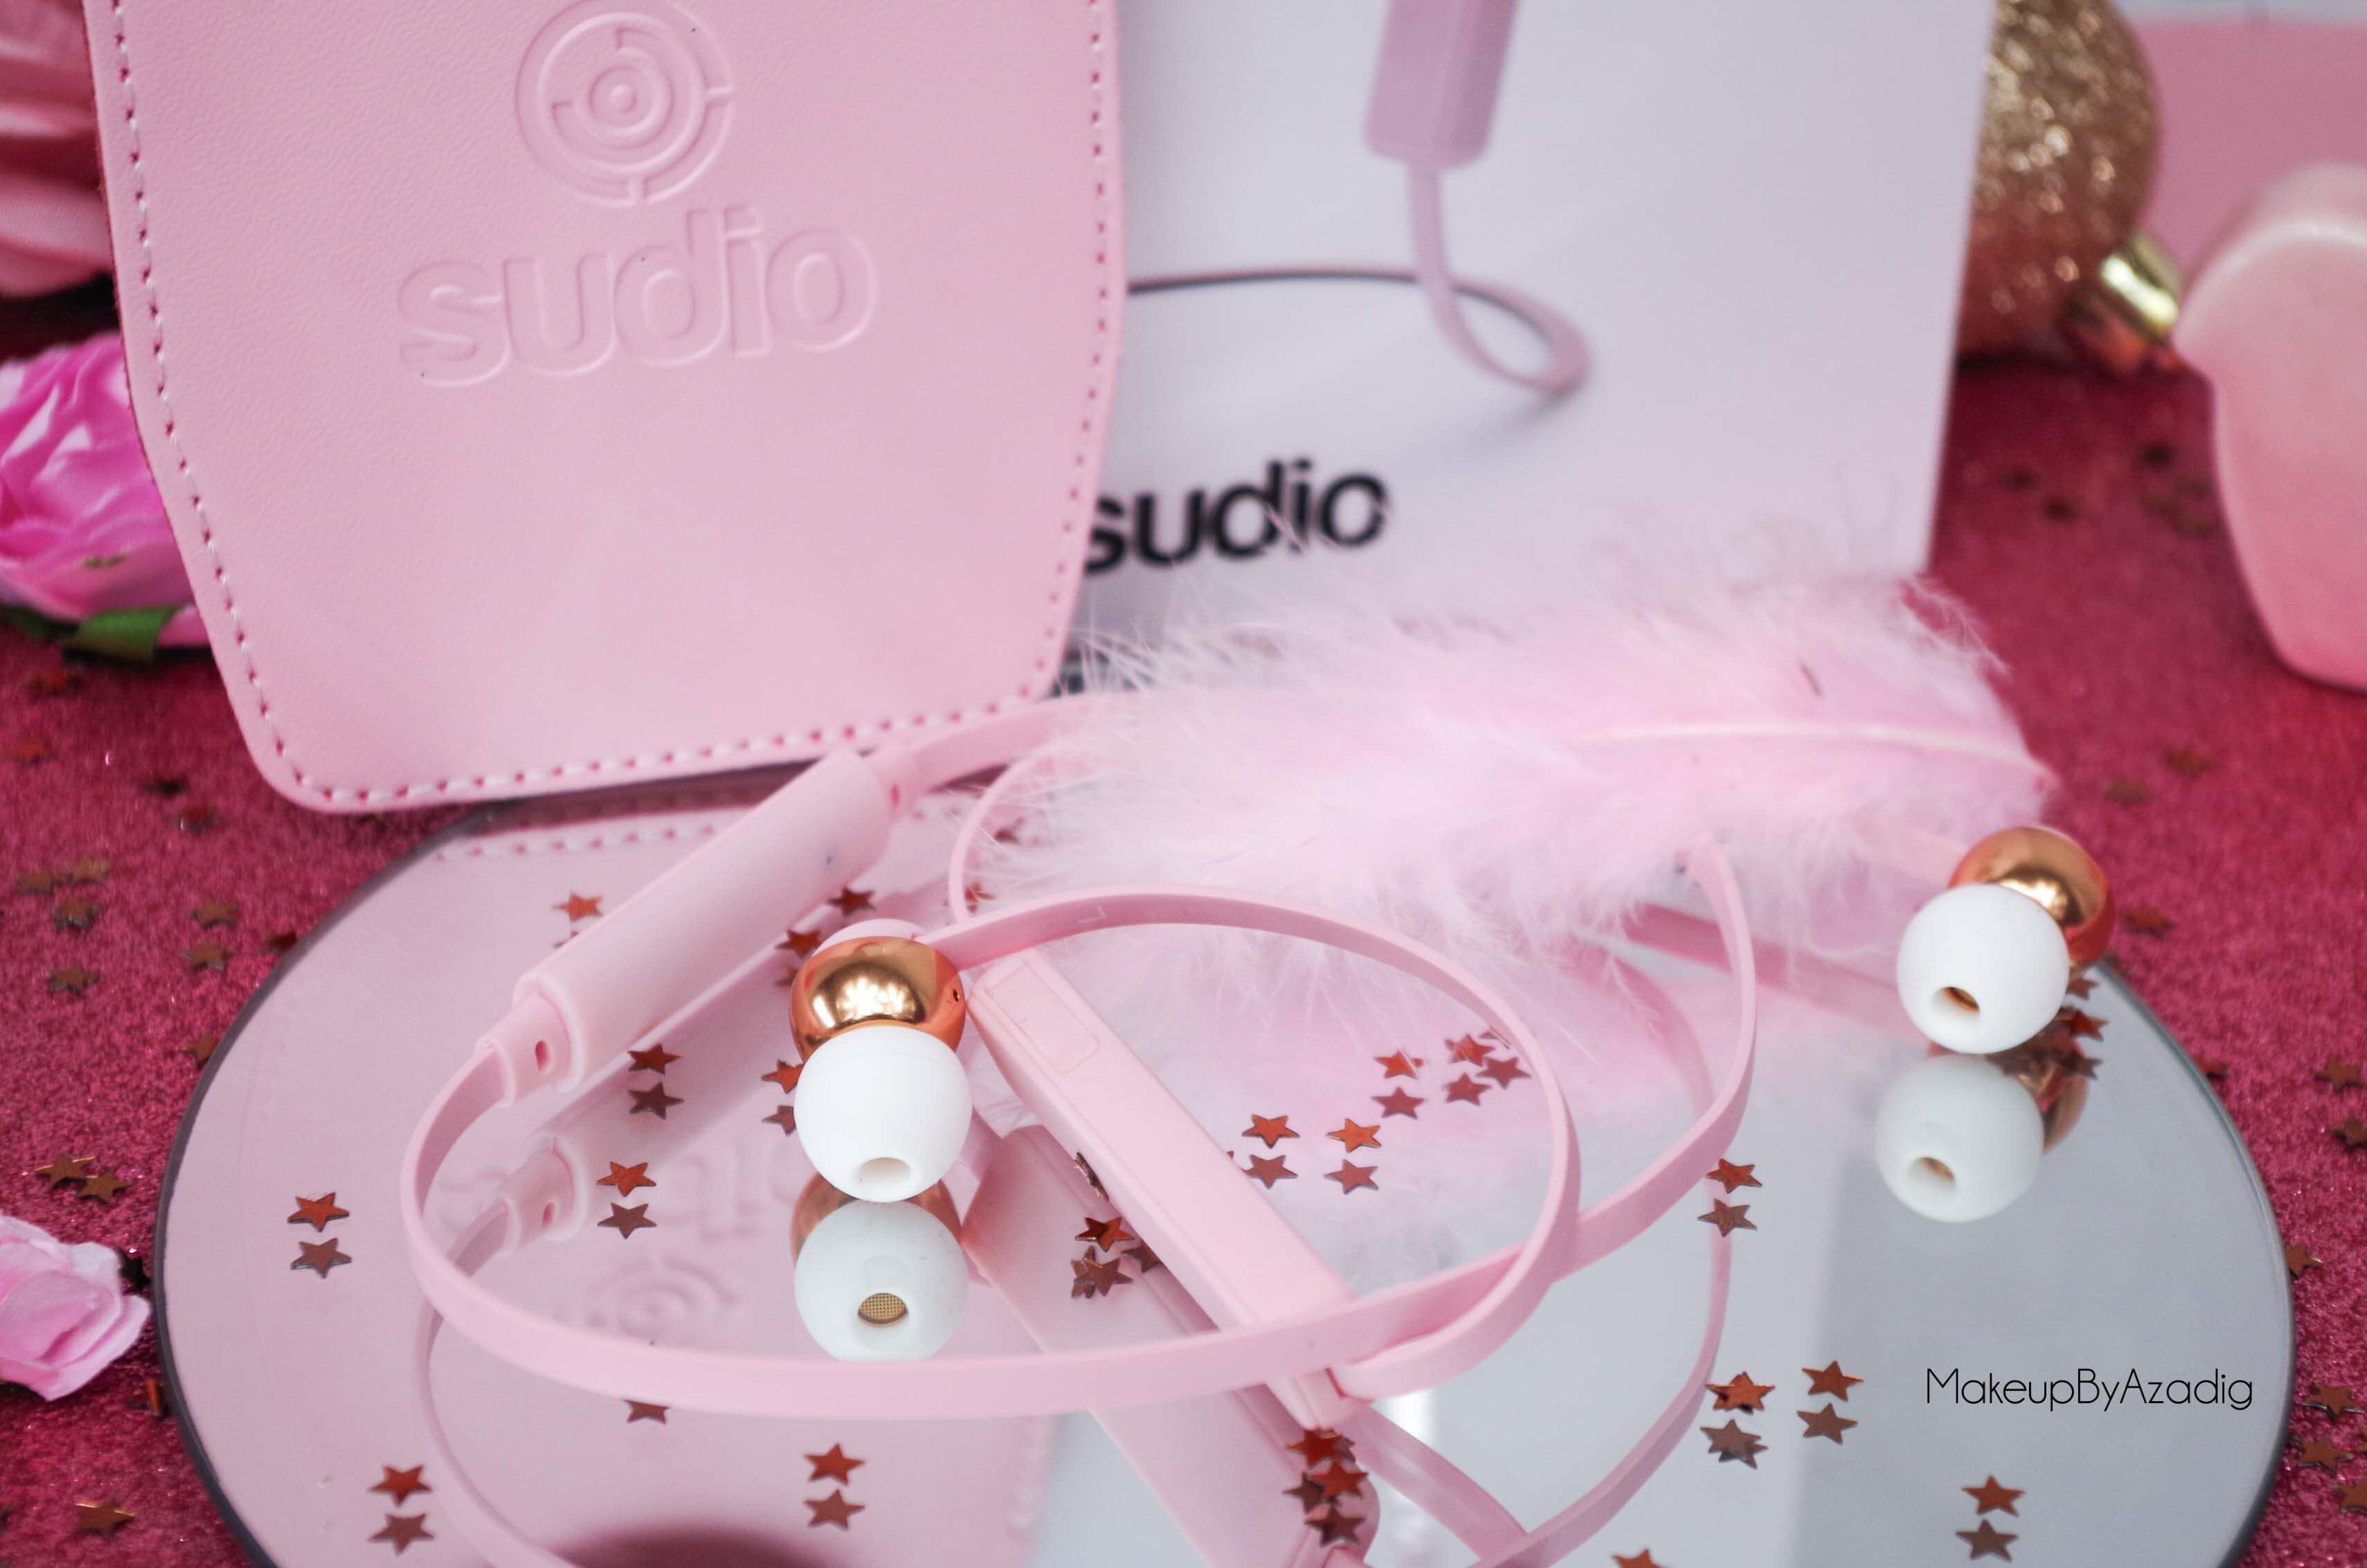 ecouteurs-casque-sans-fil-bluetooth-design-tendance-sudio-sweden-rose-vasa-bla-makeupbyazadig-avis-prix-plume